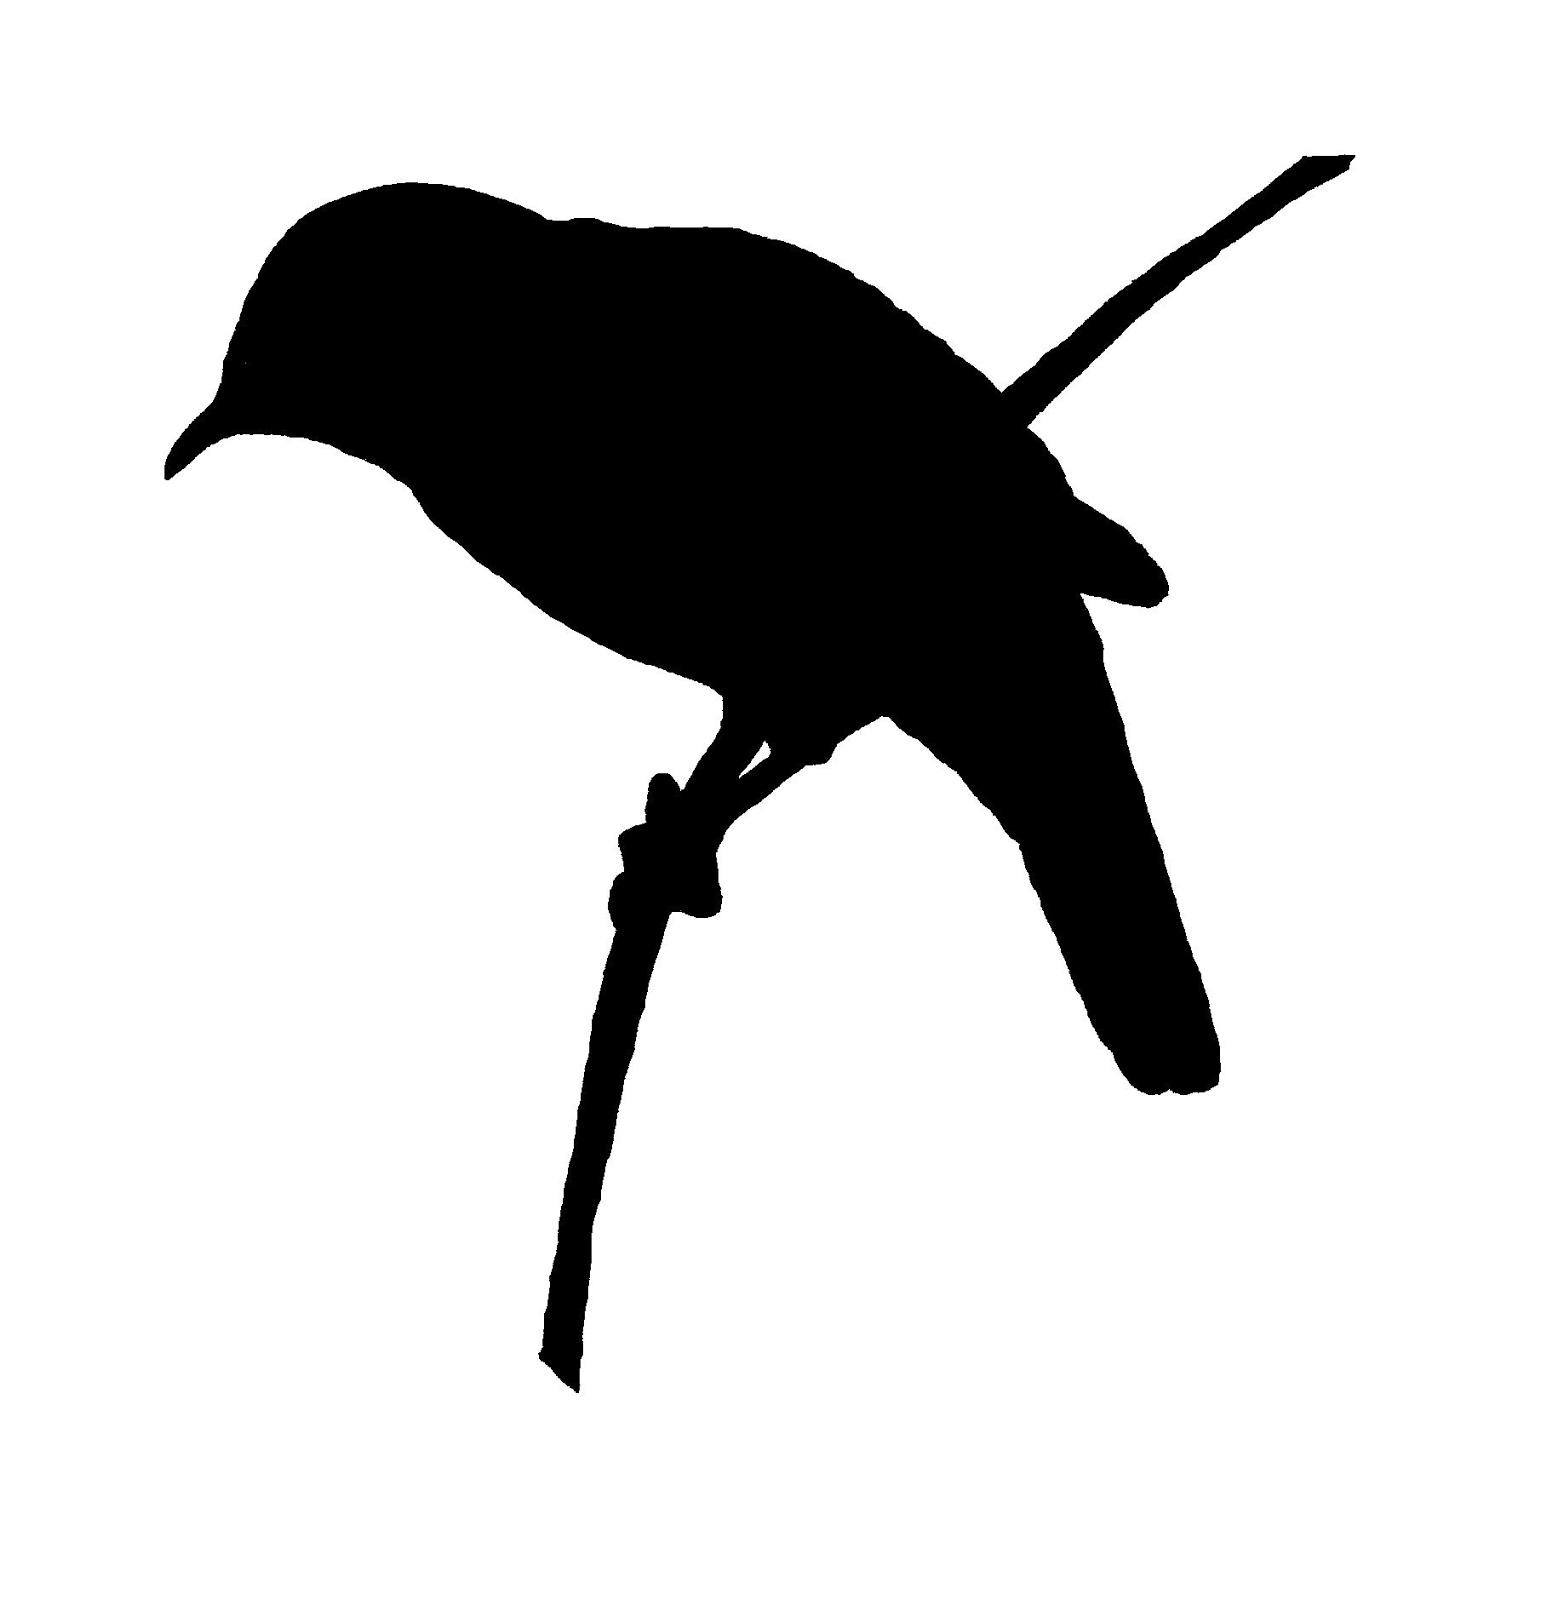 1564x1600 Digital Stamp Design Free Bird Image Transfer Silhouette